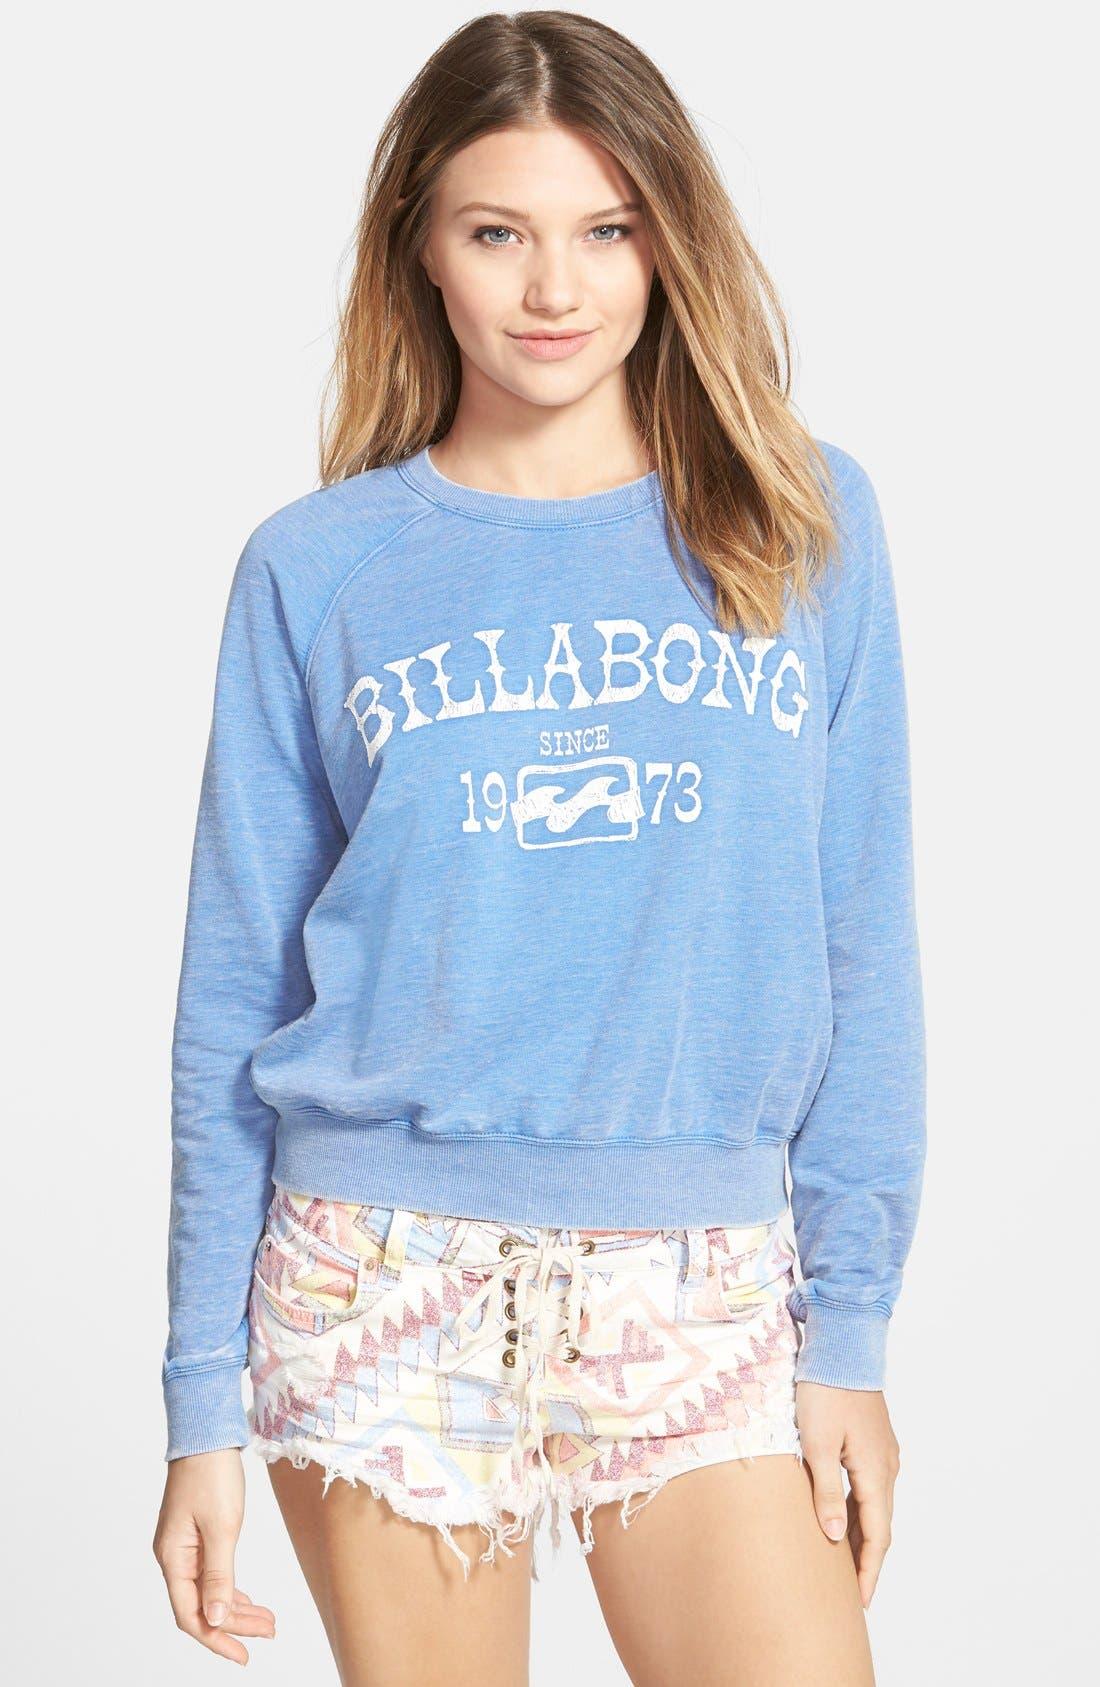 Alternate Image 1 Selected - Billabong 'Falling Back' Pullover